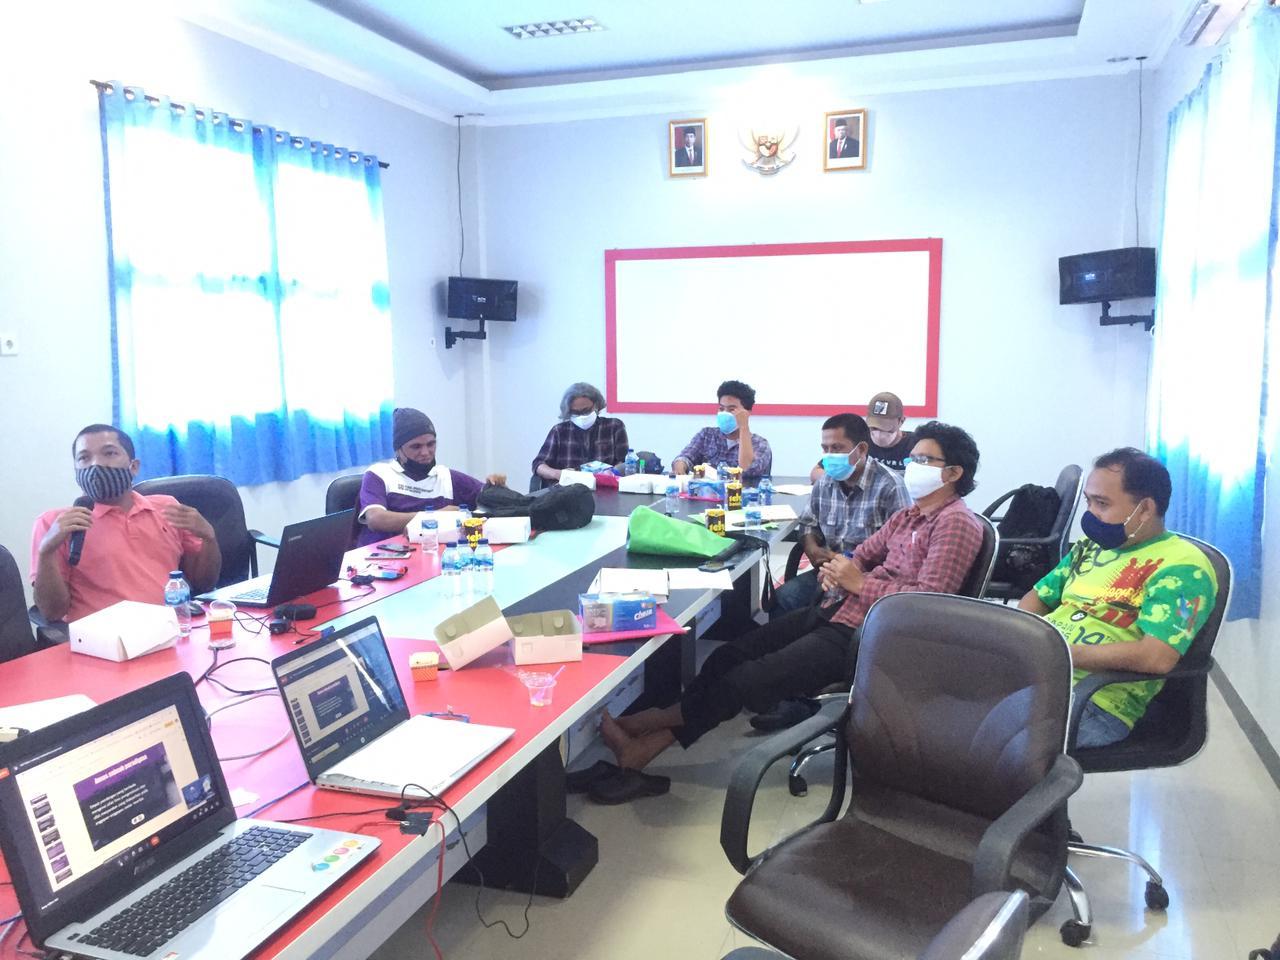 Training Ketenagakerjaan AJI Balikpapan jadi Cikal Bakal Lahirnya Serikat Pekerja Lintas Media